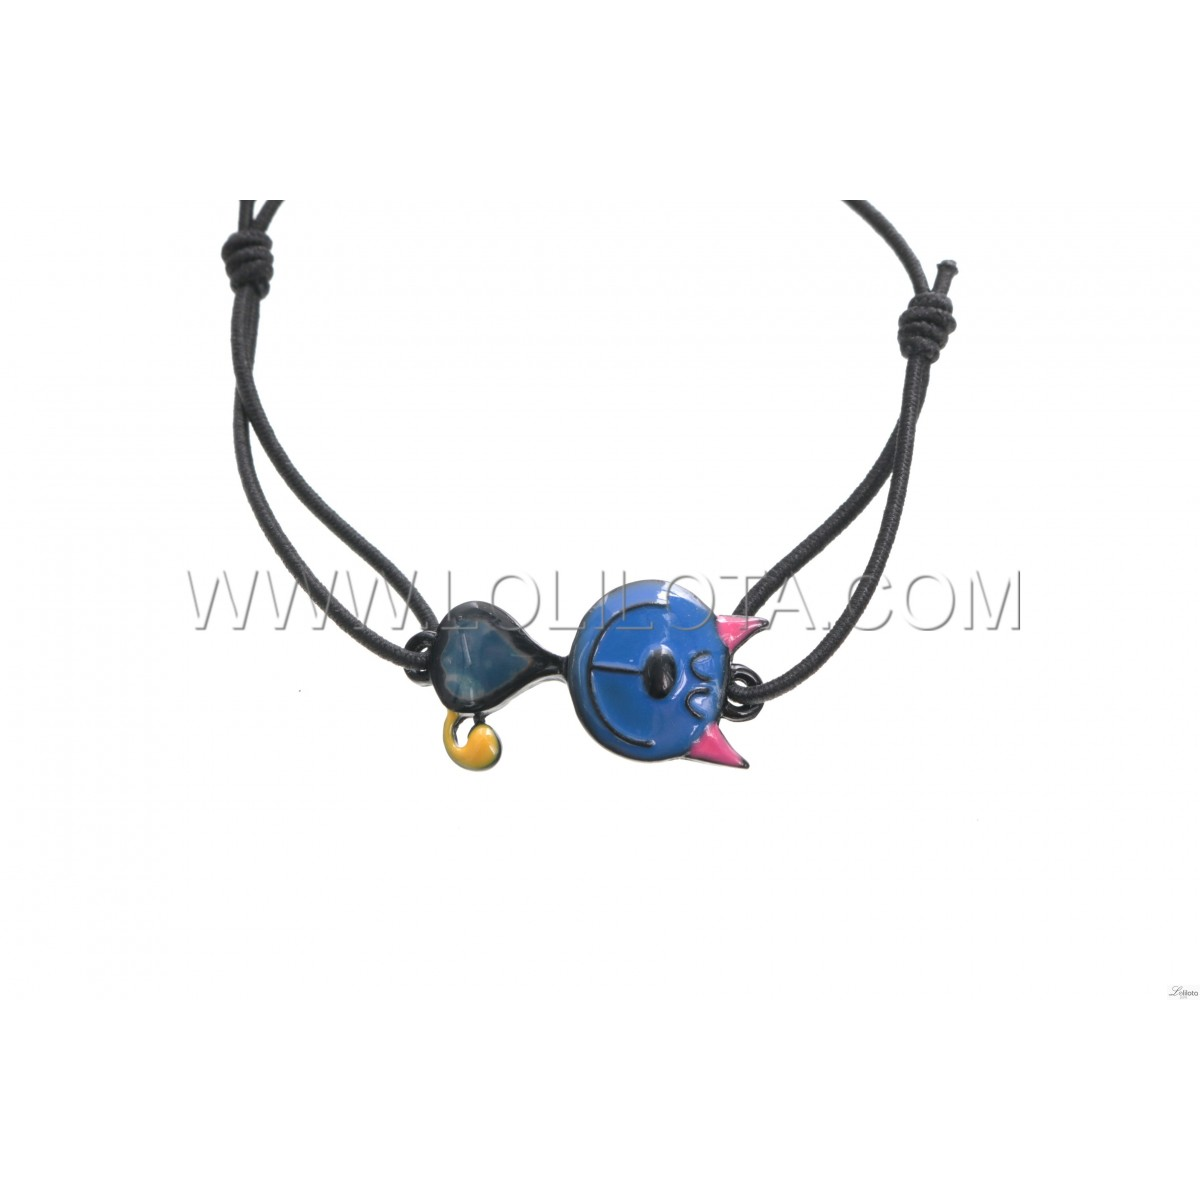 Bracelet Tom assorties (19ean132s)